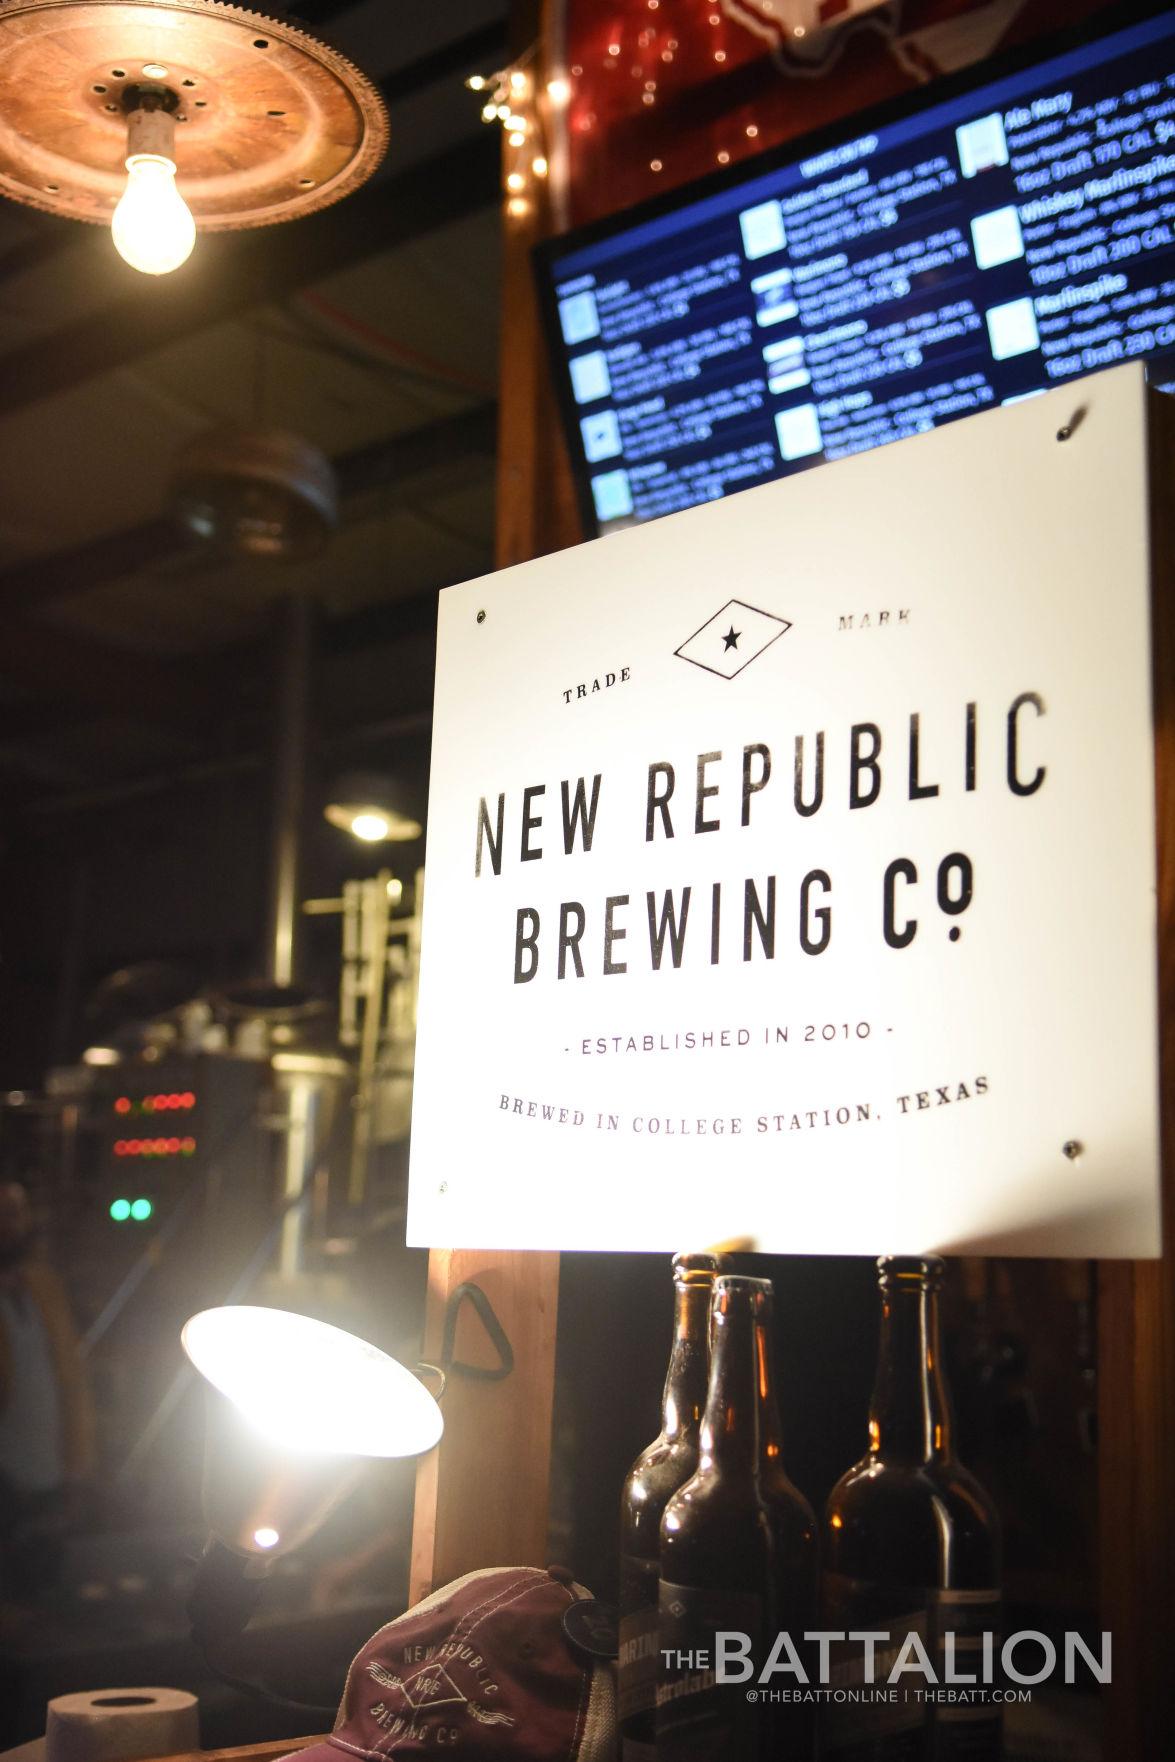 New Republic Brewing Co.